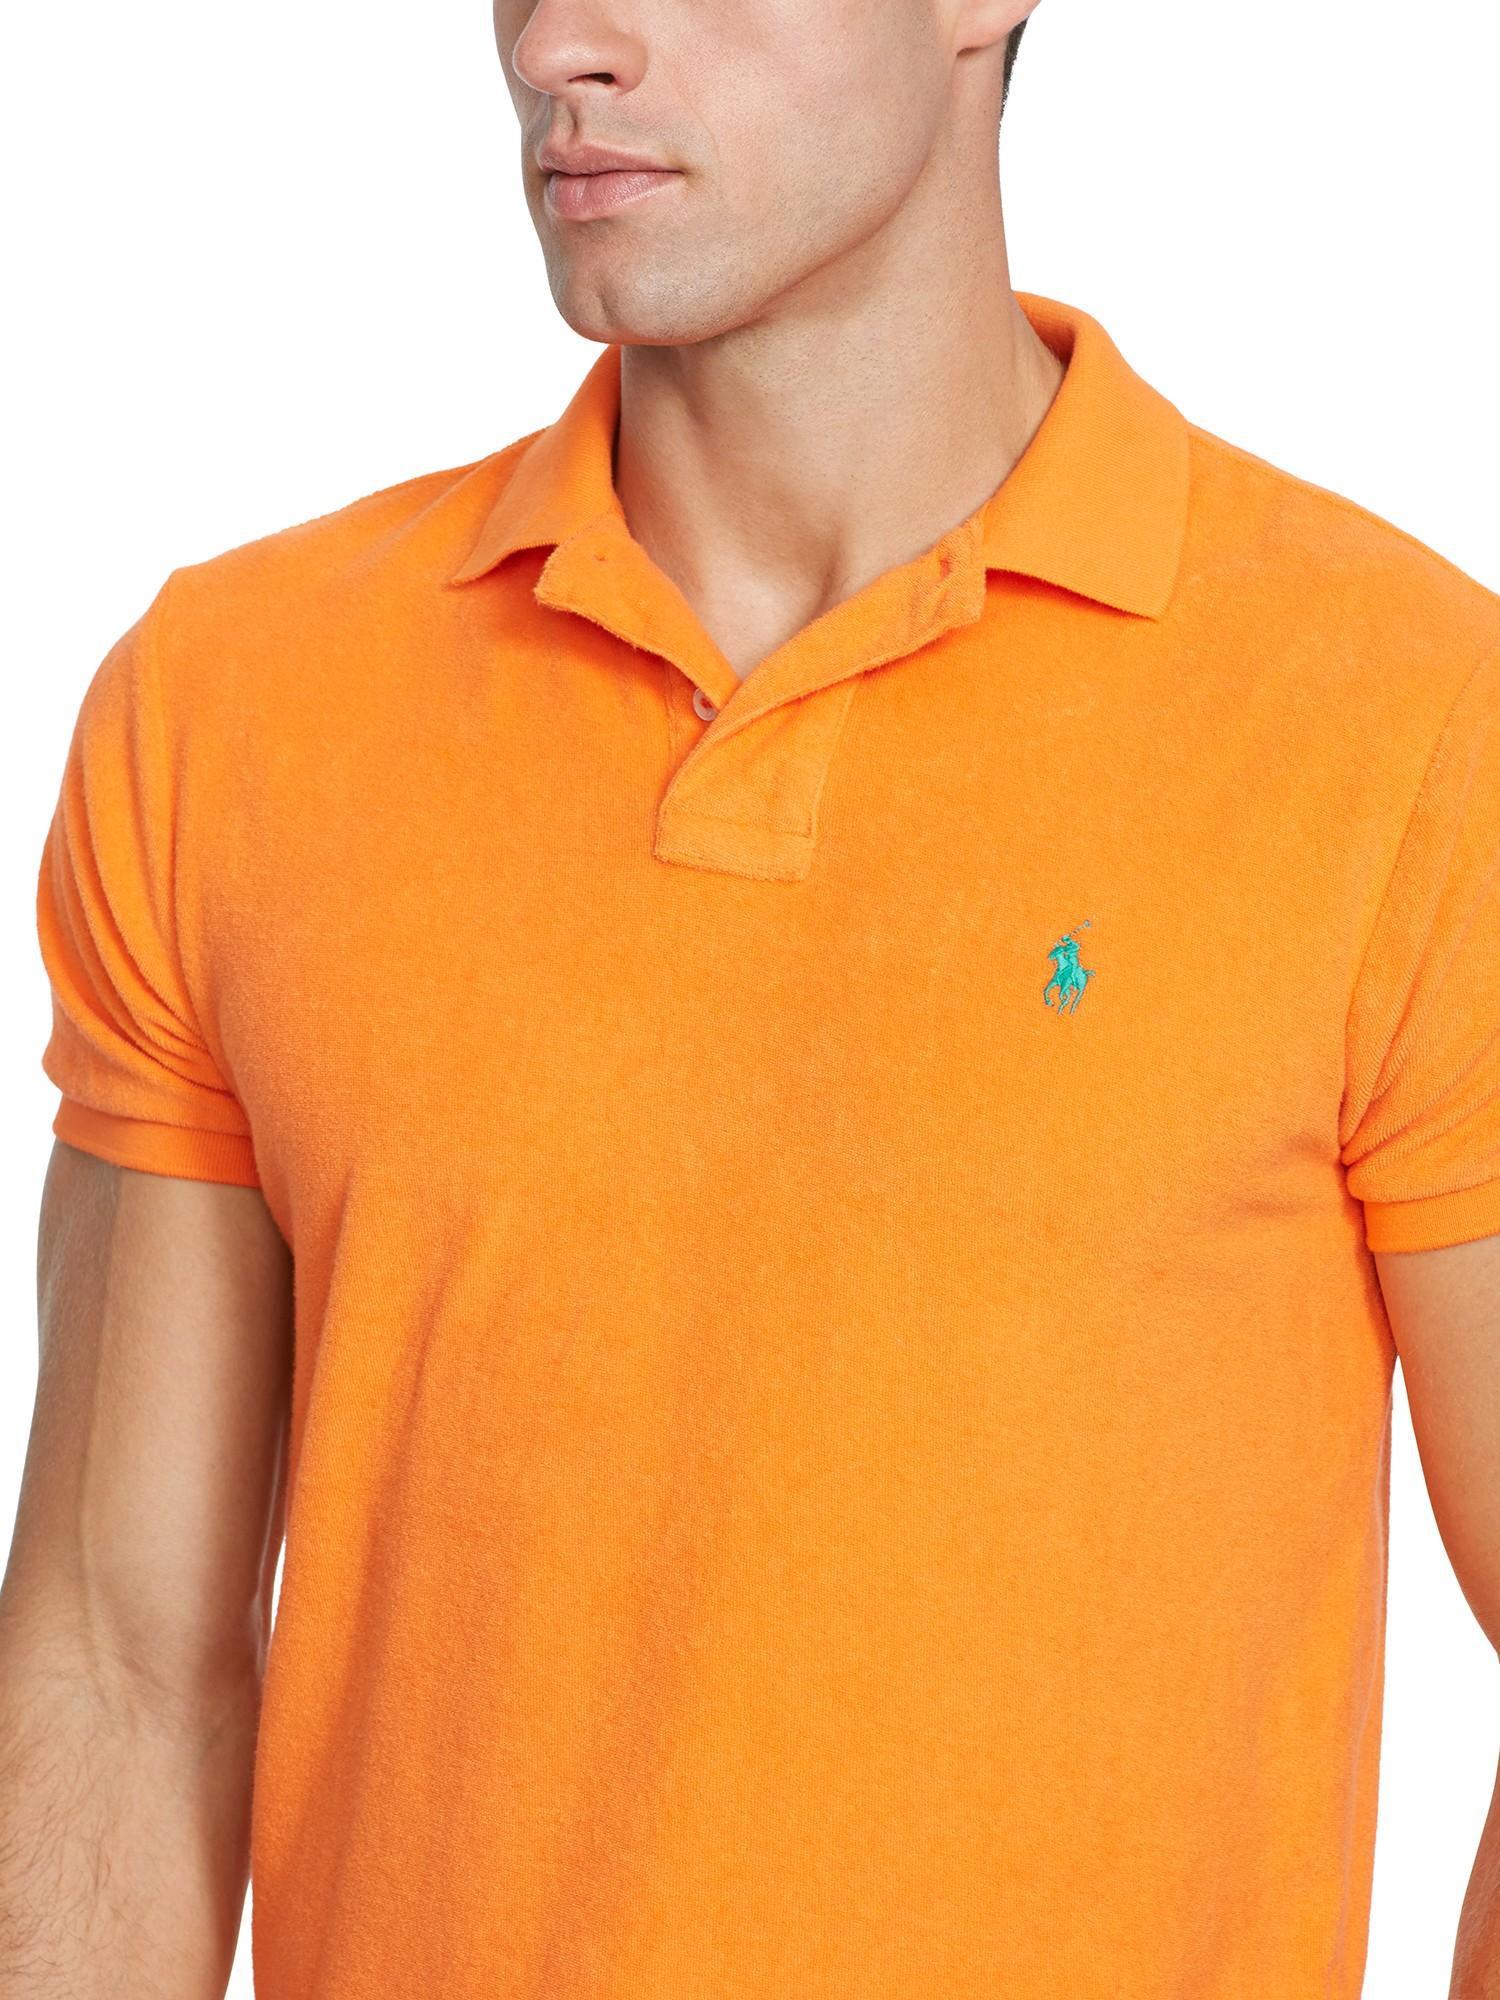 Lauren Fit Ralph Shirt Polo Orange Cloth Custom Men For Terry yYgIf6vb7